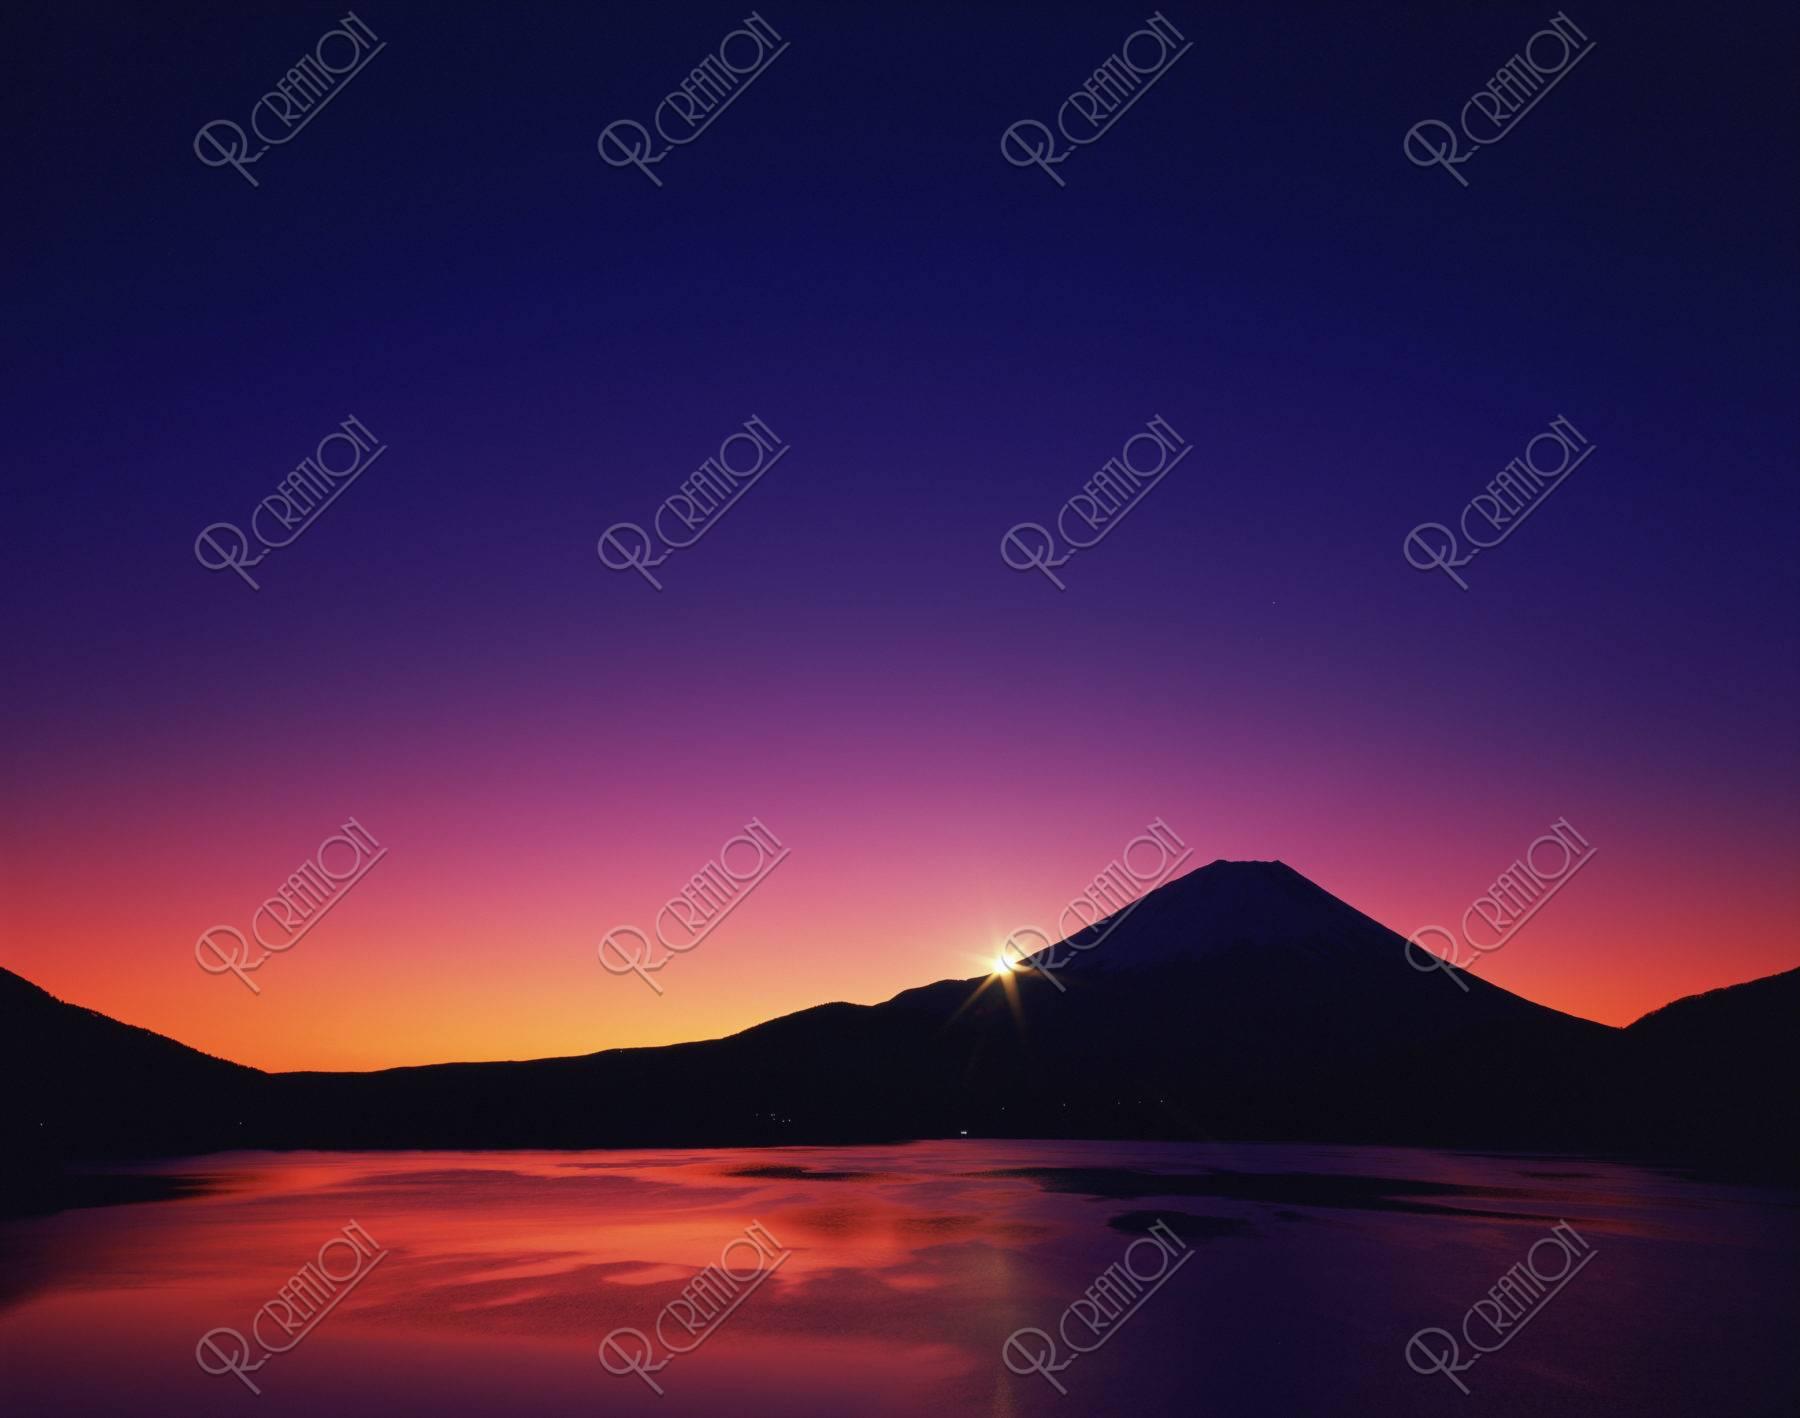 朝日 富士山 本栖湖 湖 山 雲 日の出